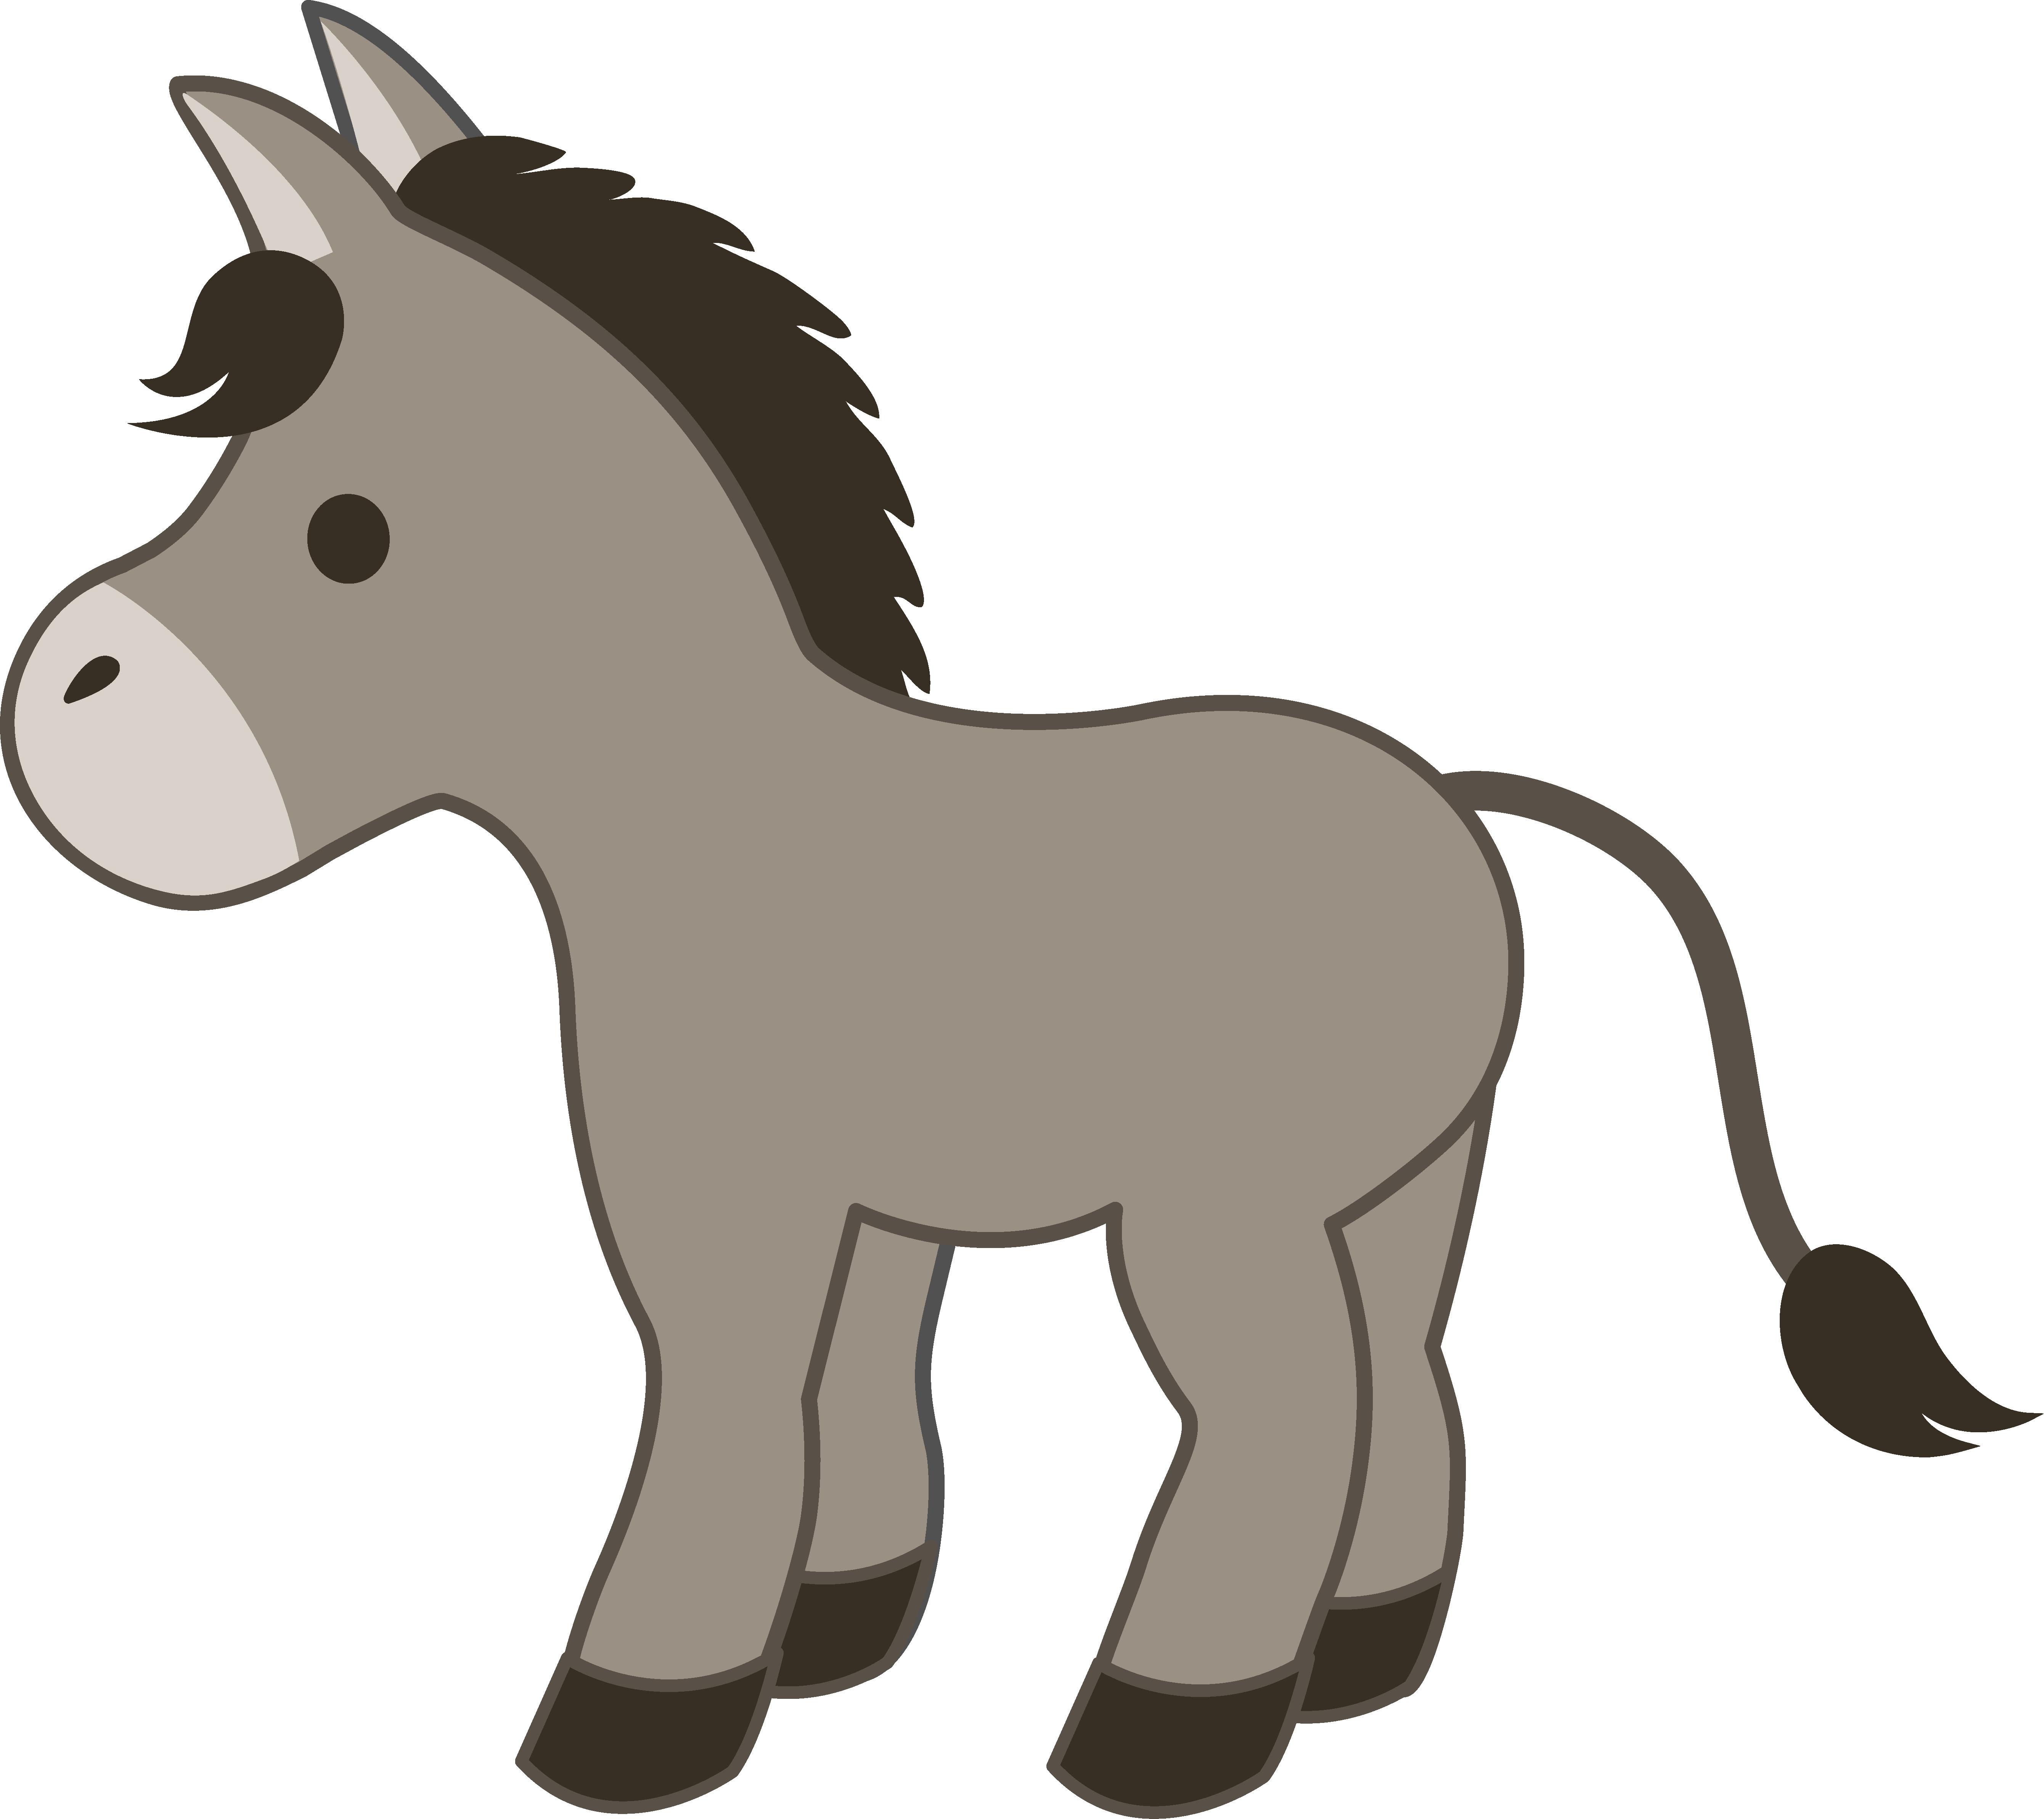 D easyeng from httpsweetclipartcomcutegraydonkey. Donkey clipart nativity donkey